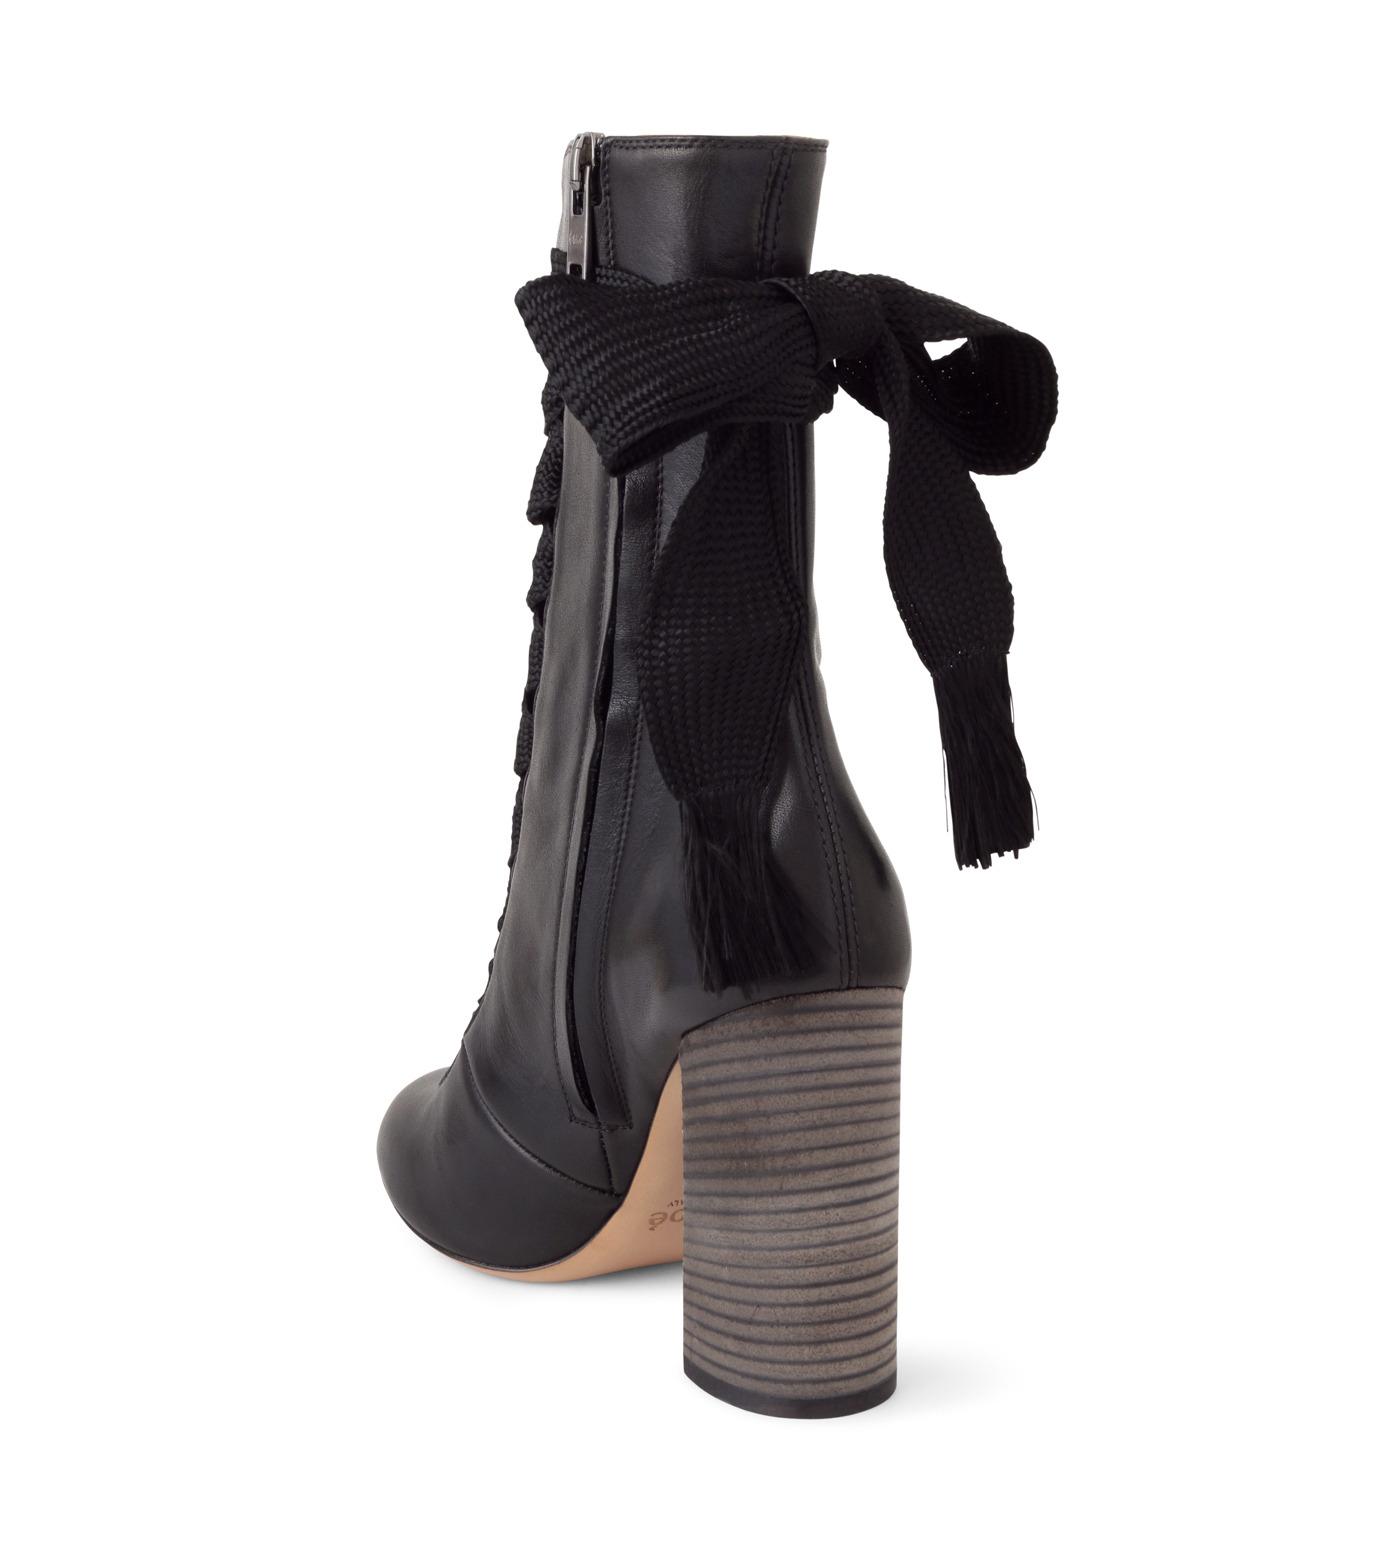 Chloe(クロエ)のharper lace up boots-BLACK(ブーツ/boots)-5534E42B-13 拡大詳細画像2